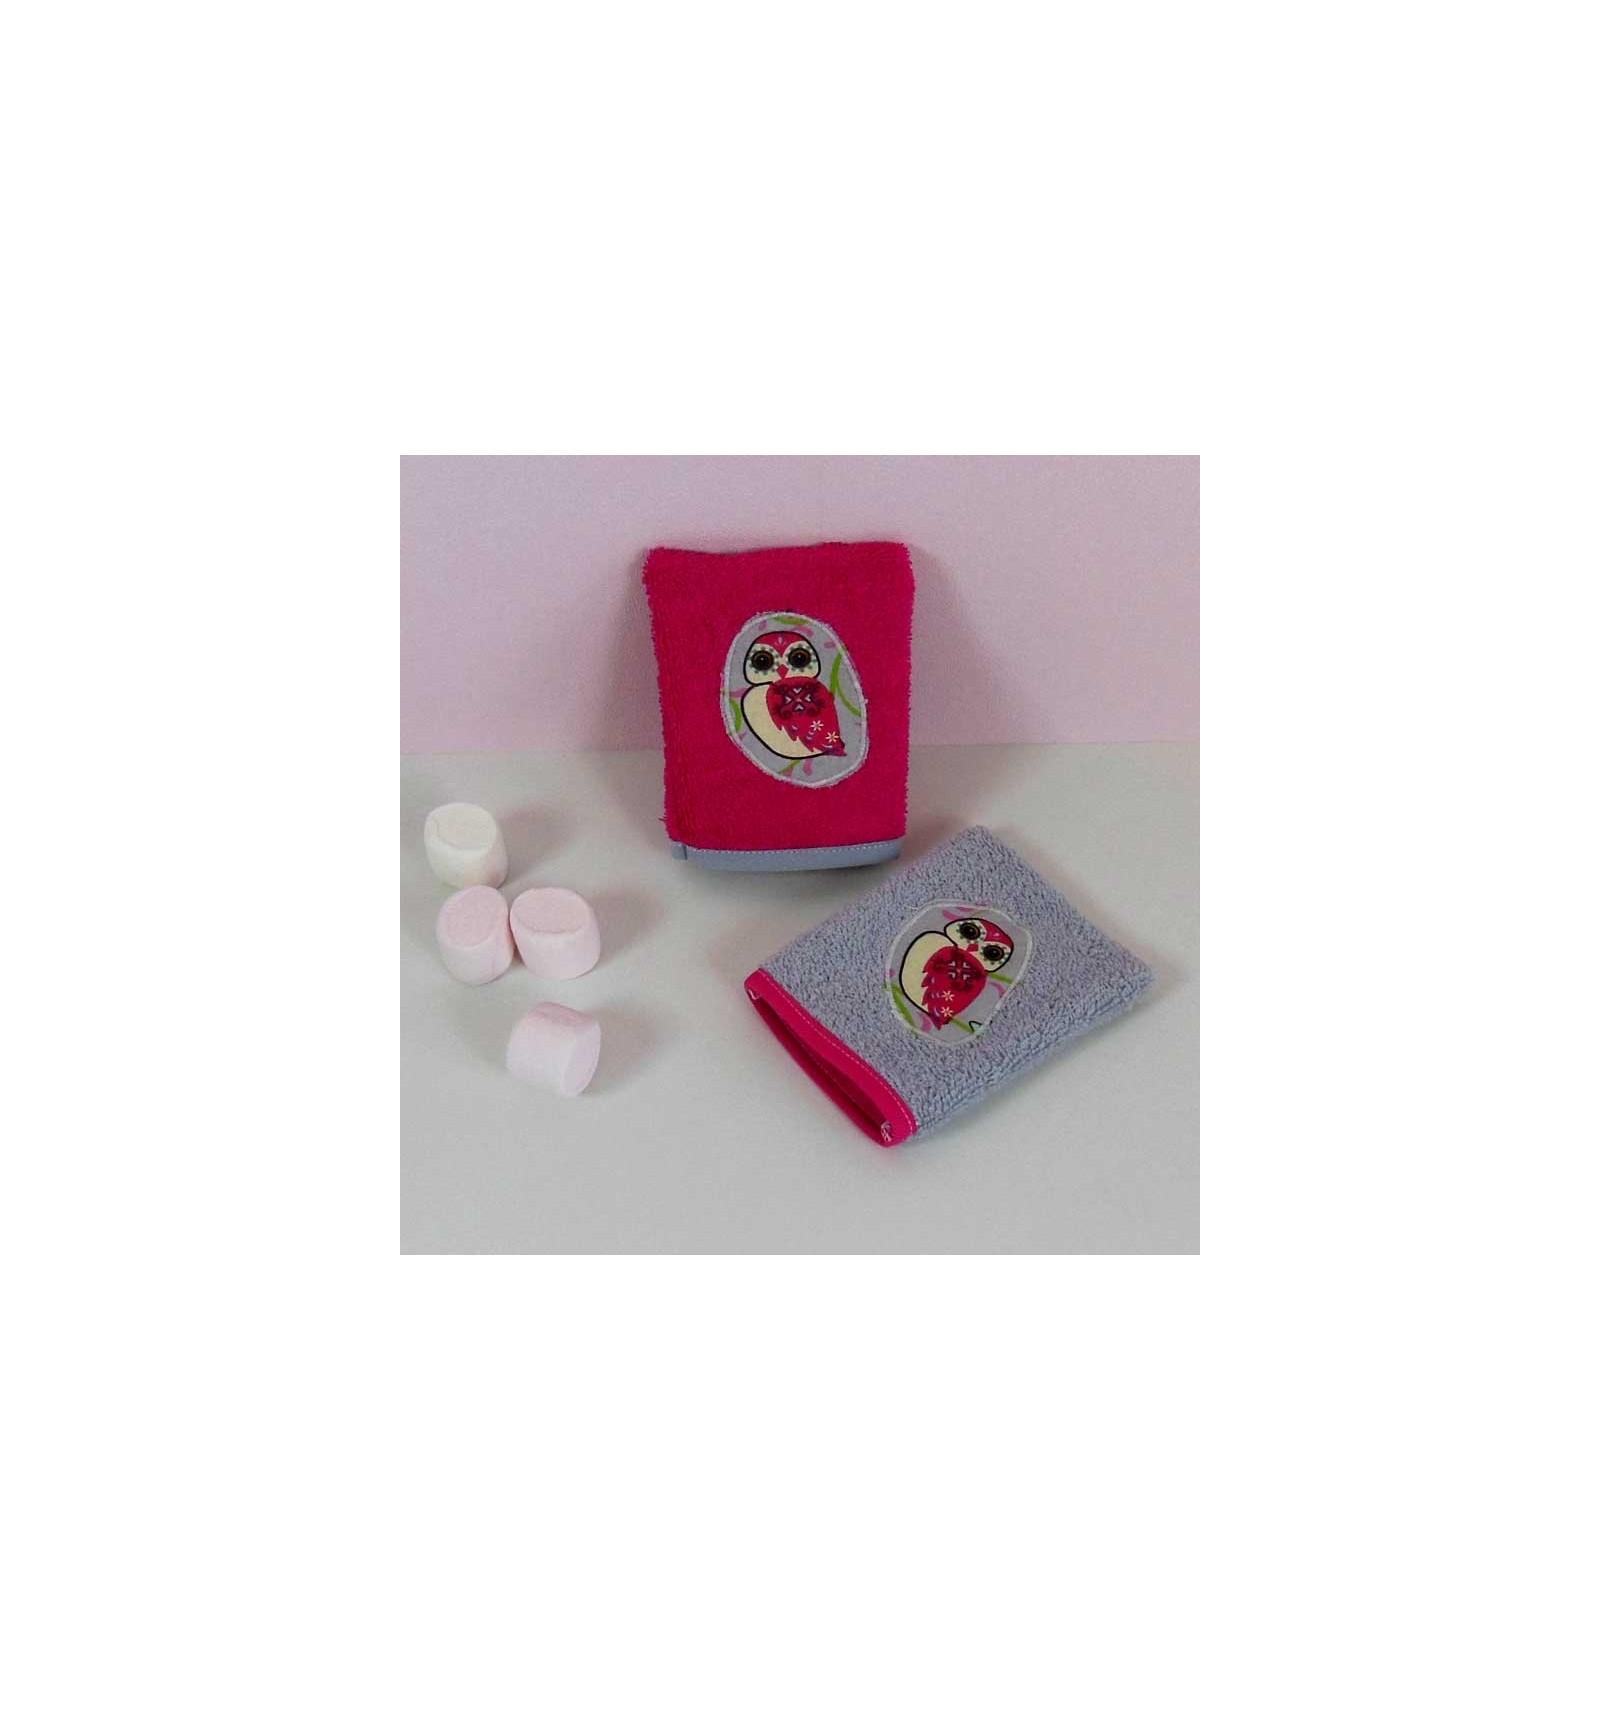 gant de toilette rose 2 gants chouette rose cr aflo. Black Bedroom Furniture Sets. Home Design Ideas